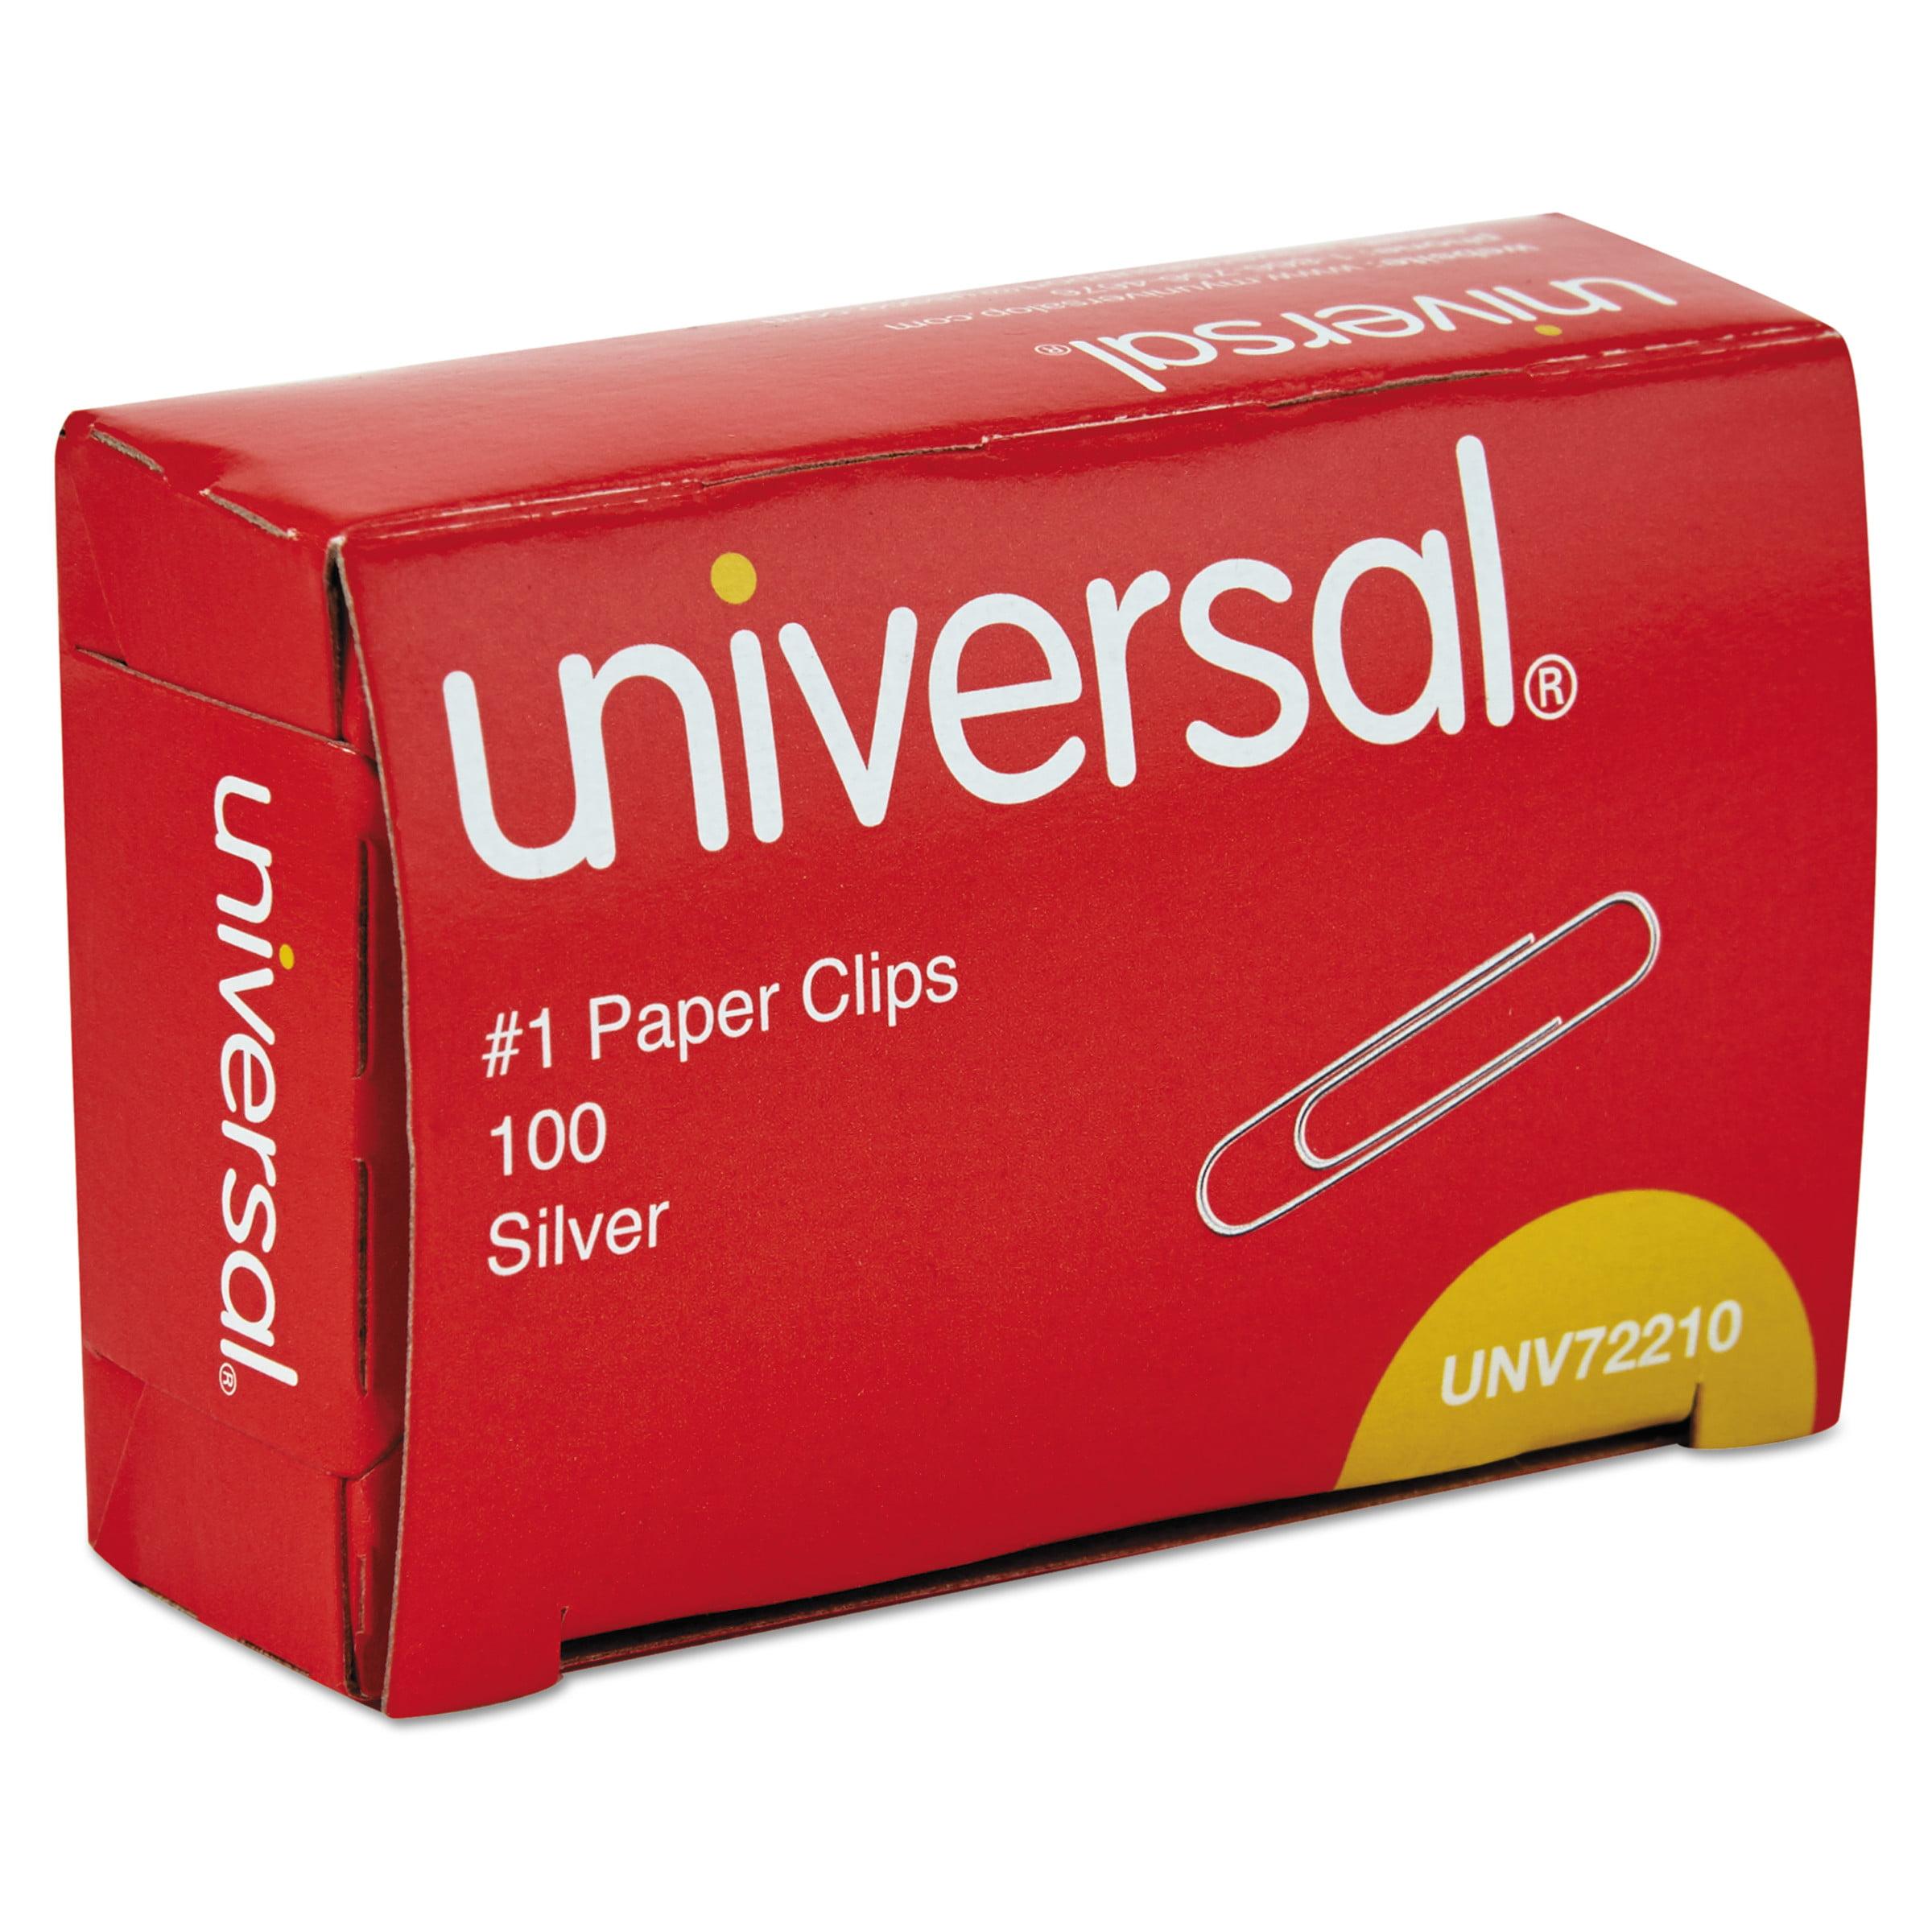 Universal Paper Clips, No. 1, Smooth, Silver, 12PK/Carton -UNV72210CT